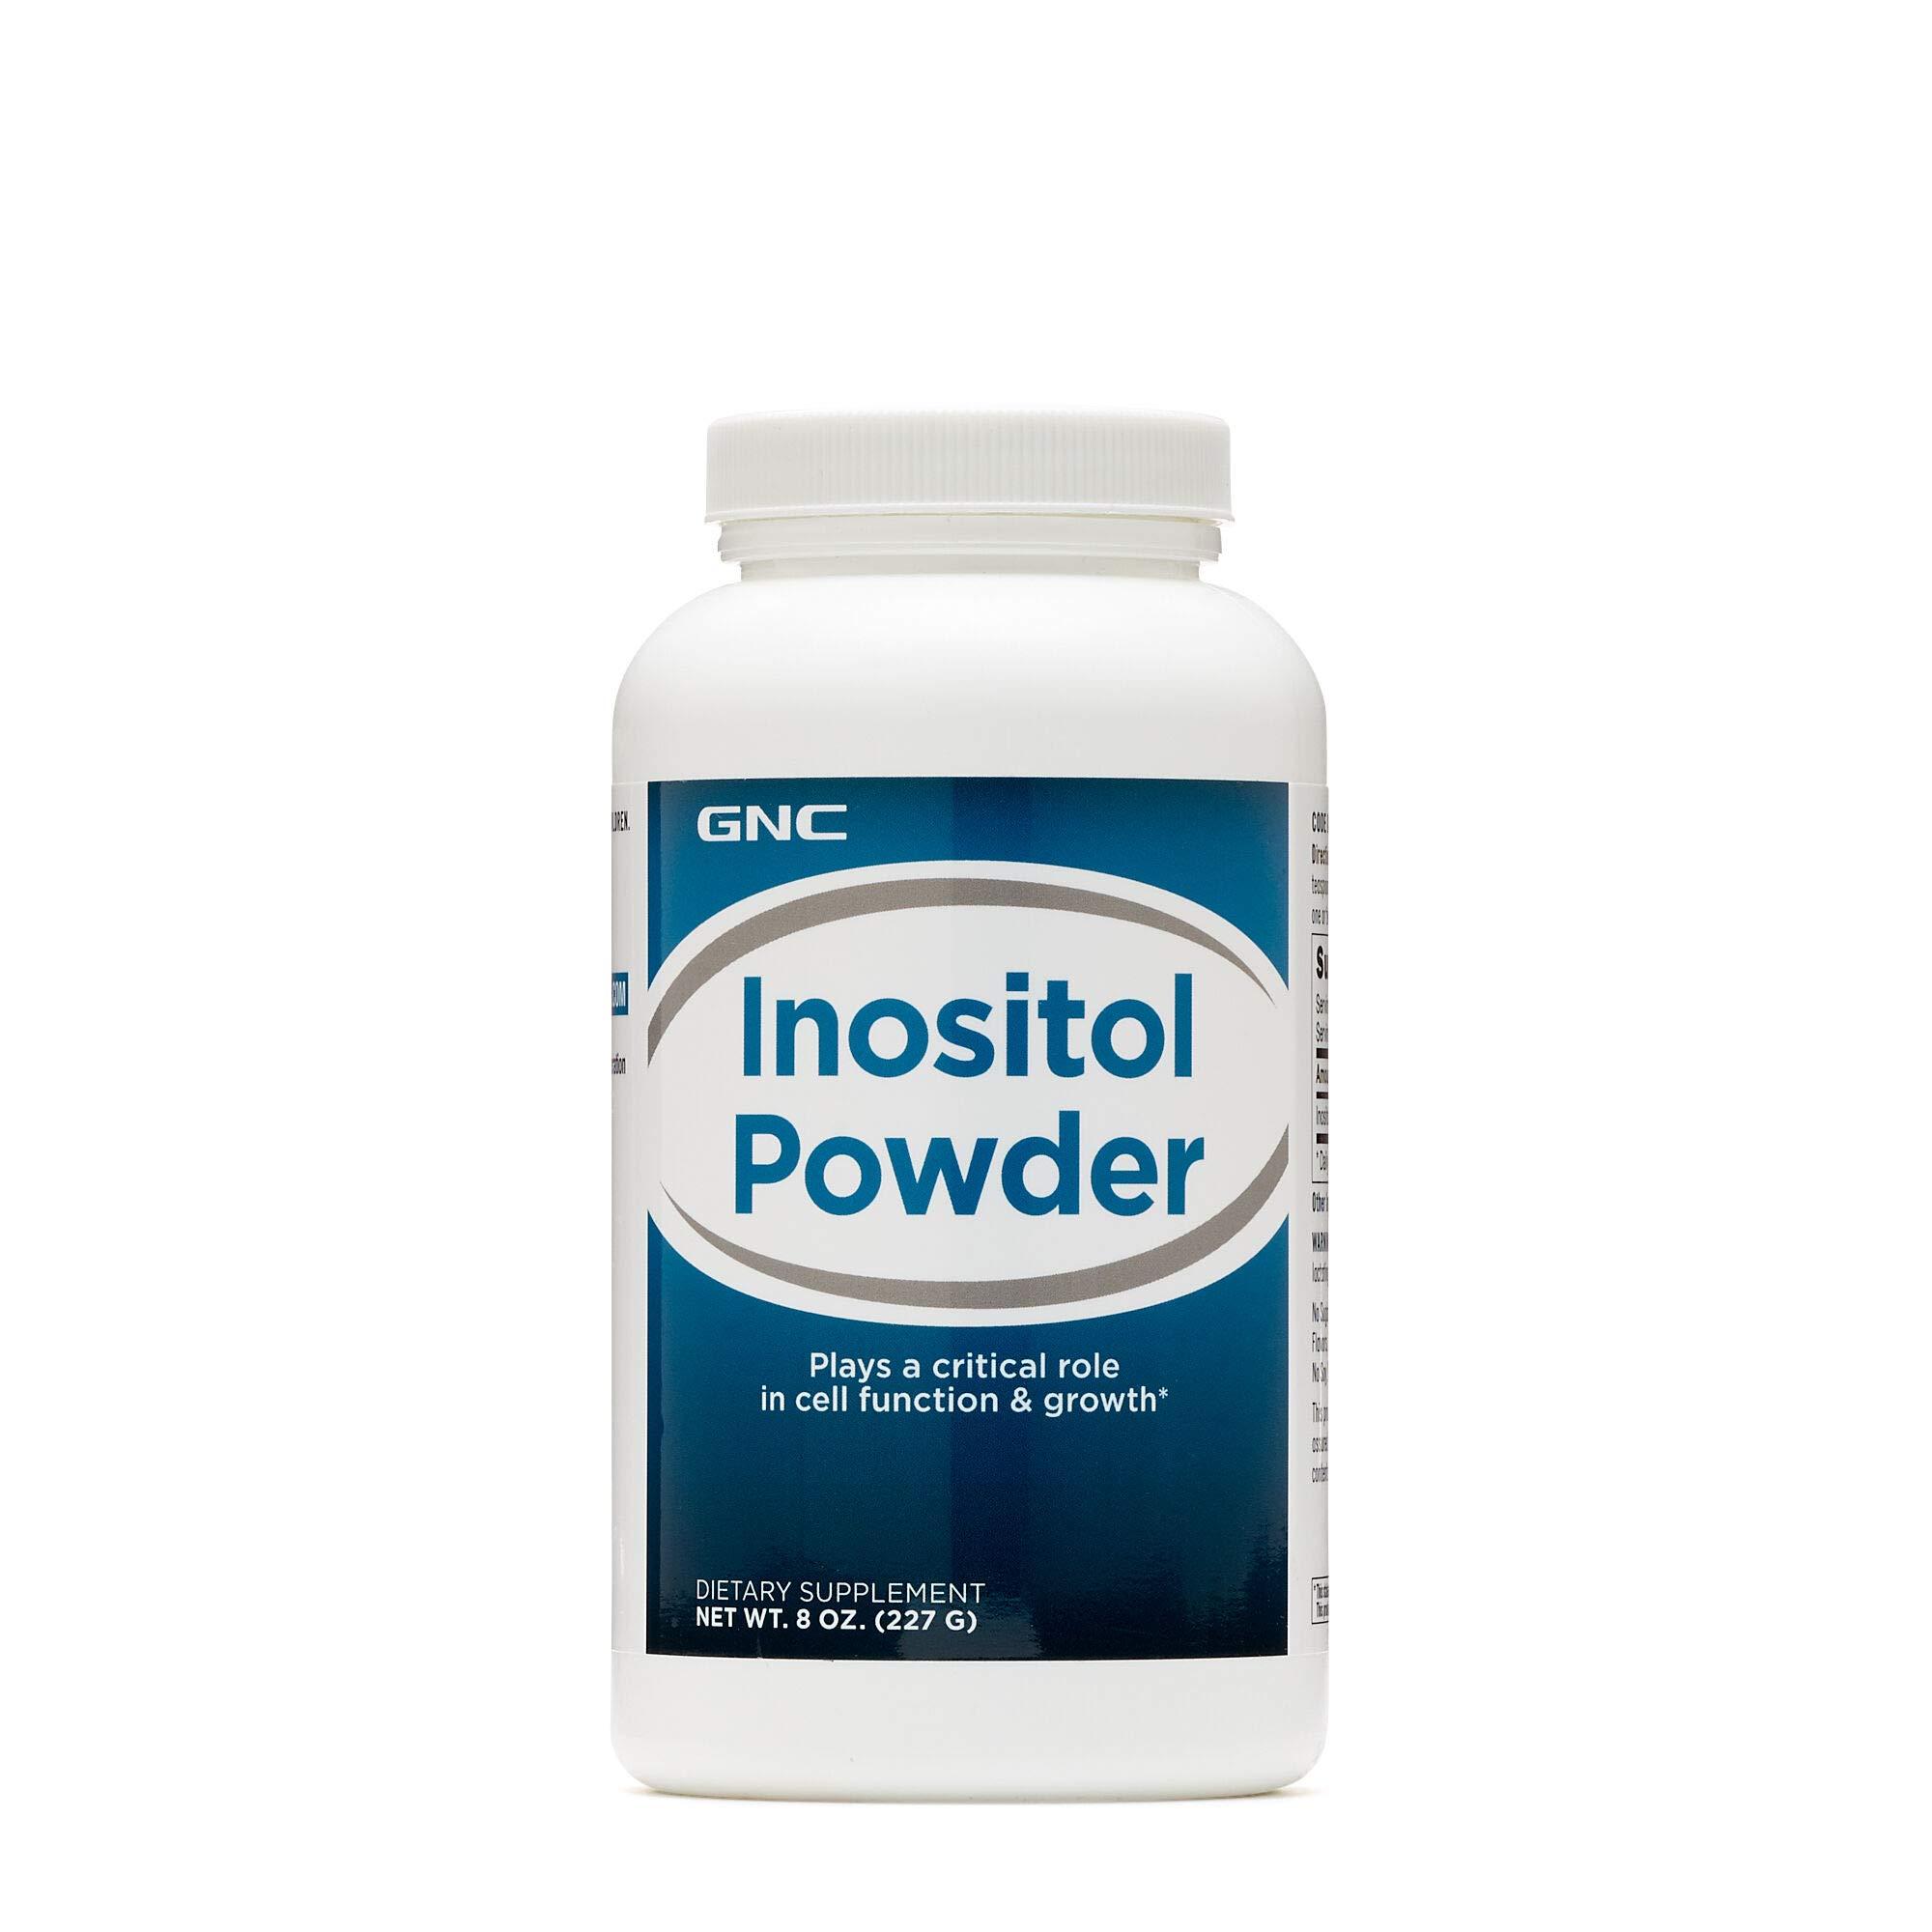 GNC Inositol Powder, 378 Servings by GNC